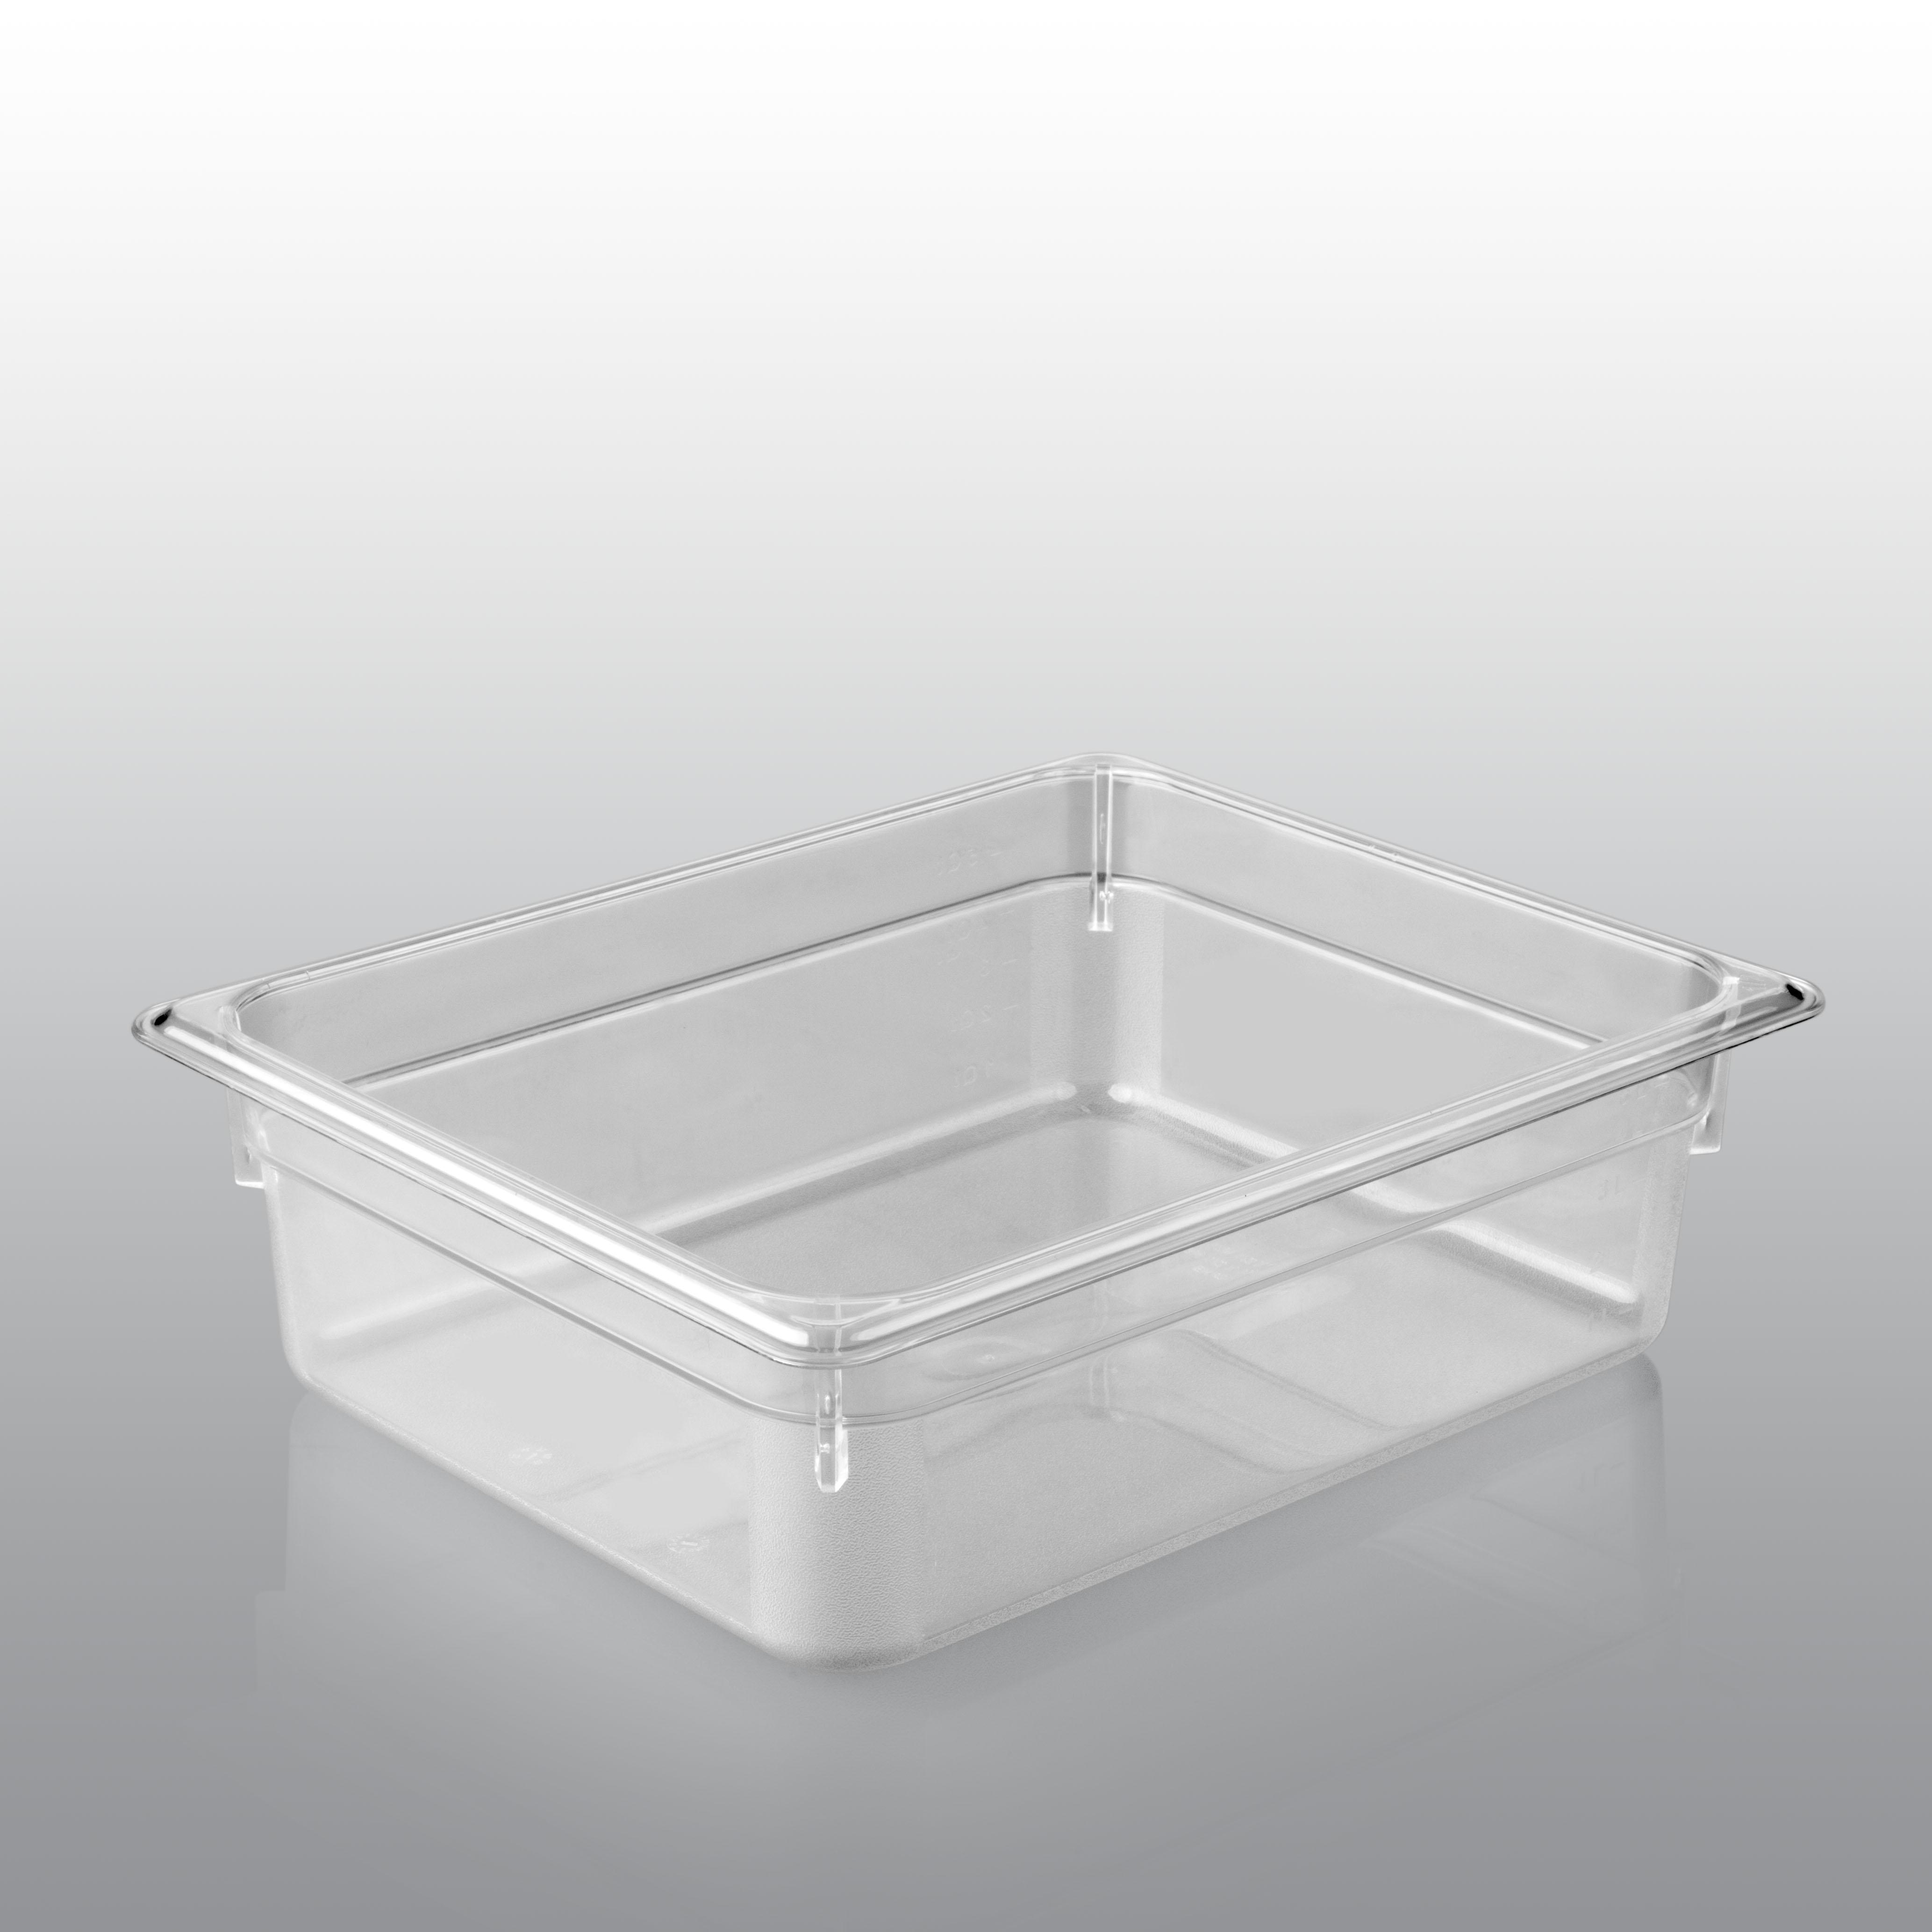 gn beh lter polycarbonat 1 2 gn 200 mm tief saro. Black Bedroom Furniture Sets. Home Design Ideas